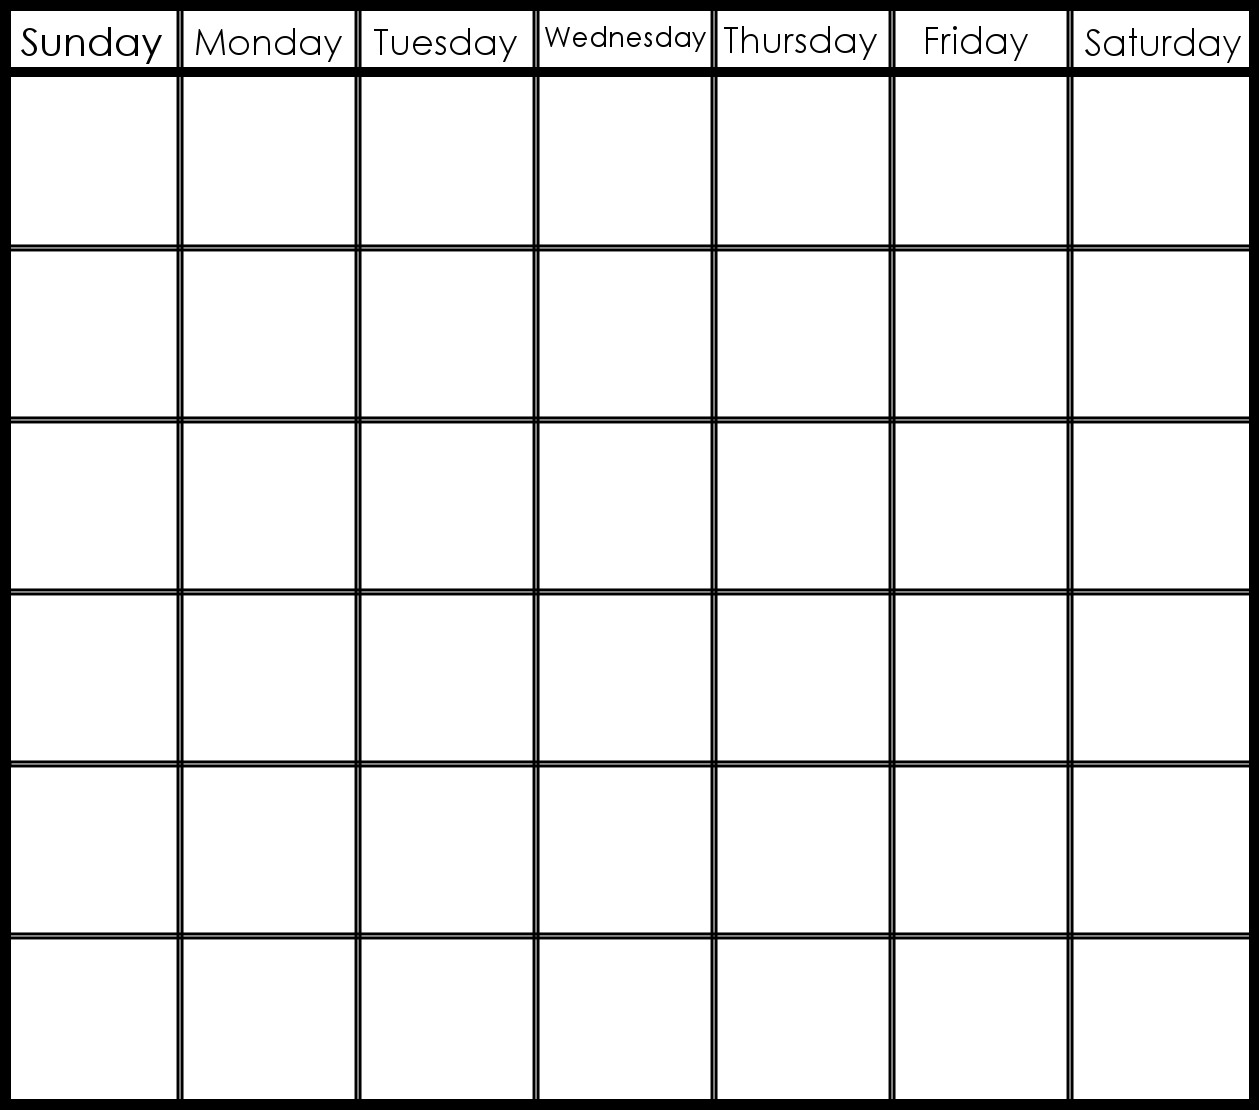 6 Week Printable Calendar | Printable Calendar Templates 2019 inside 6 Week Blank Calendar Printable